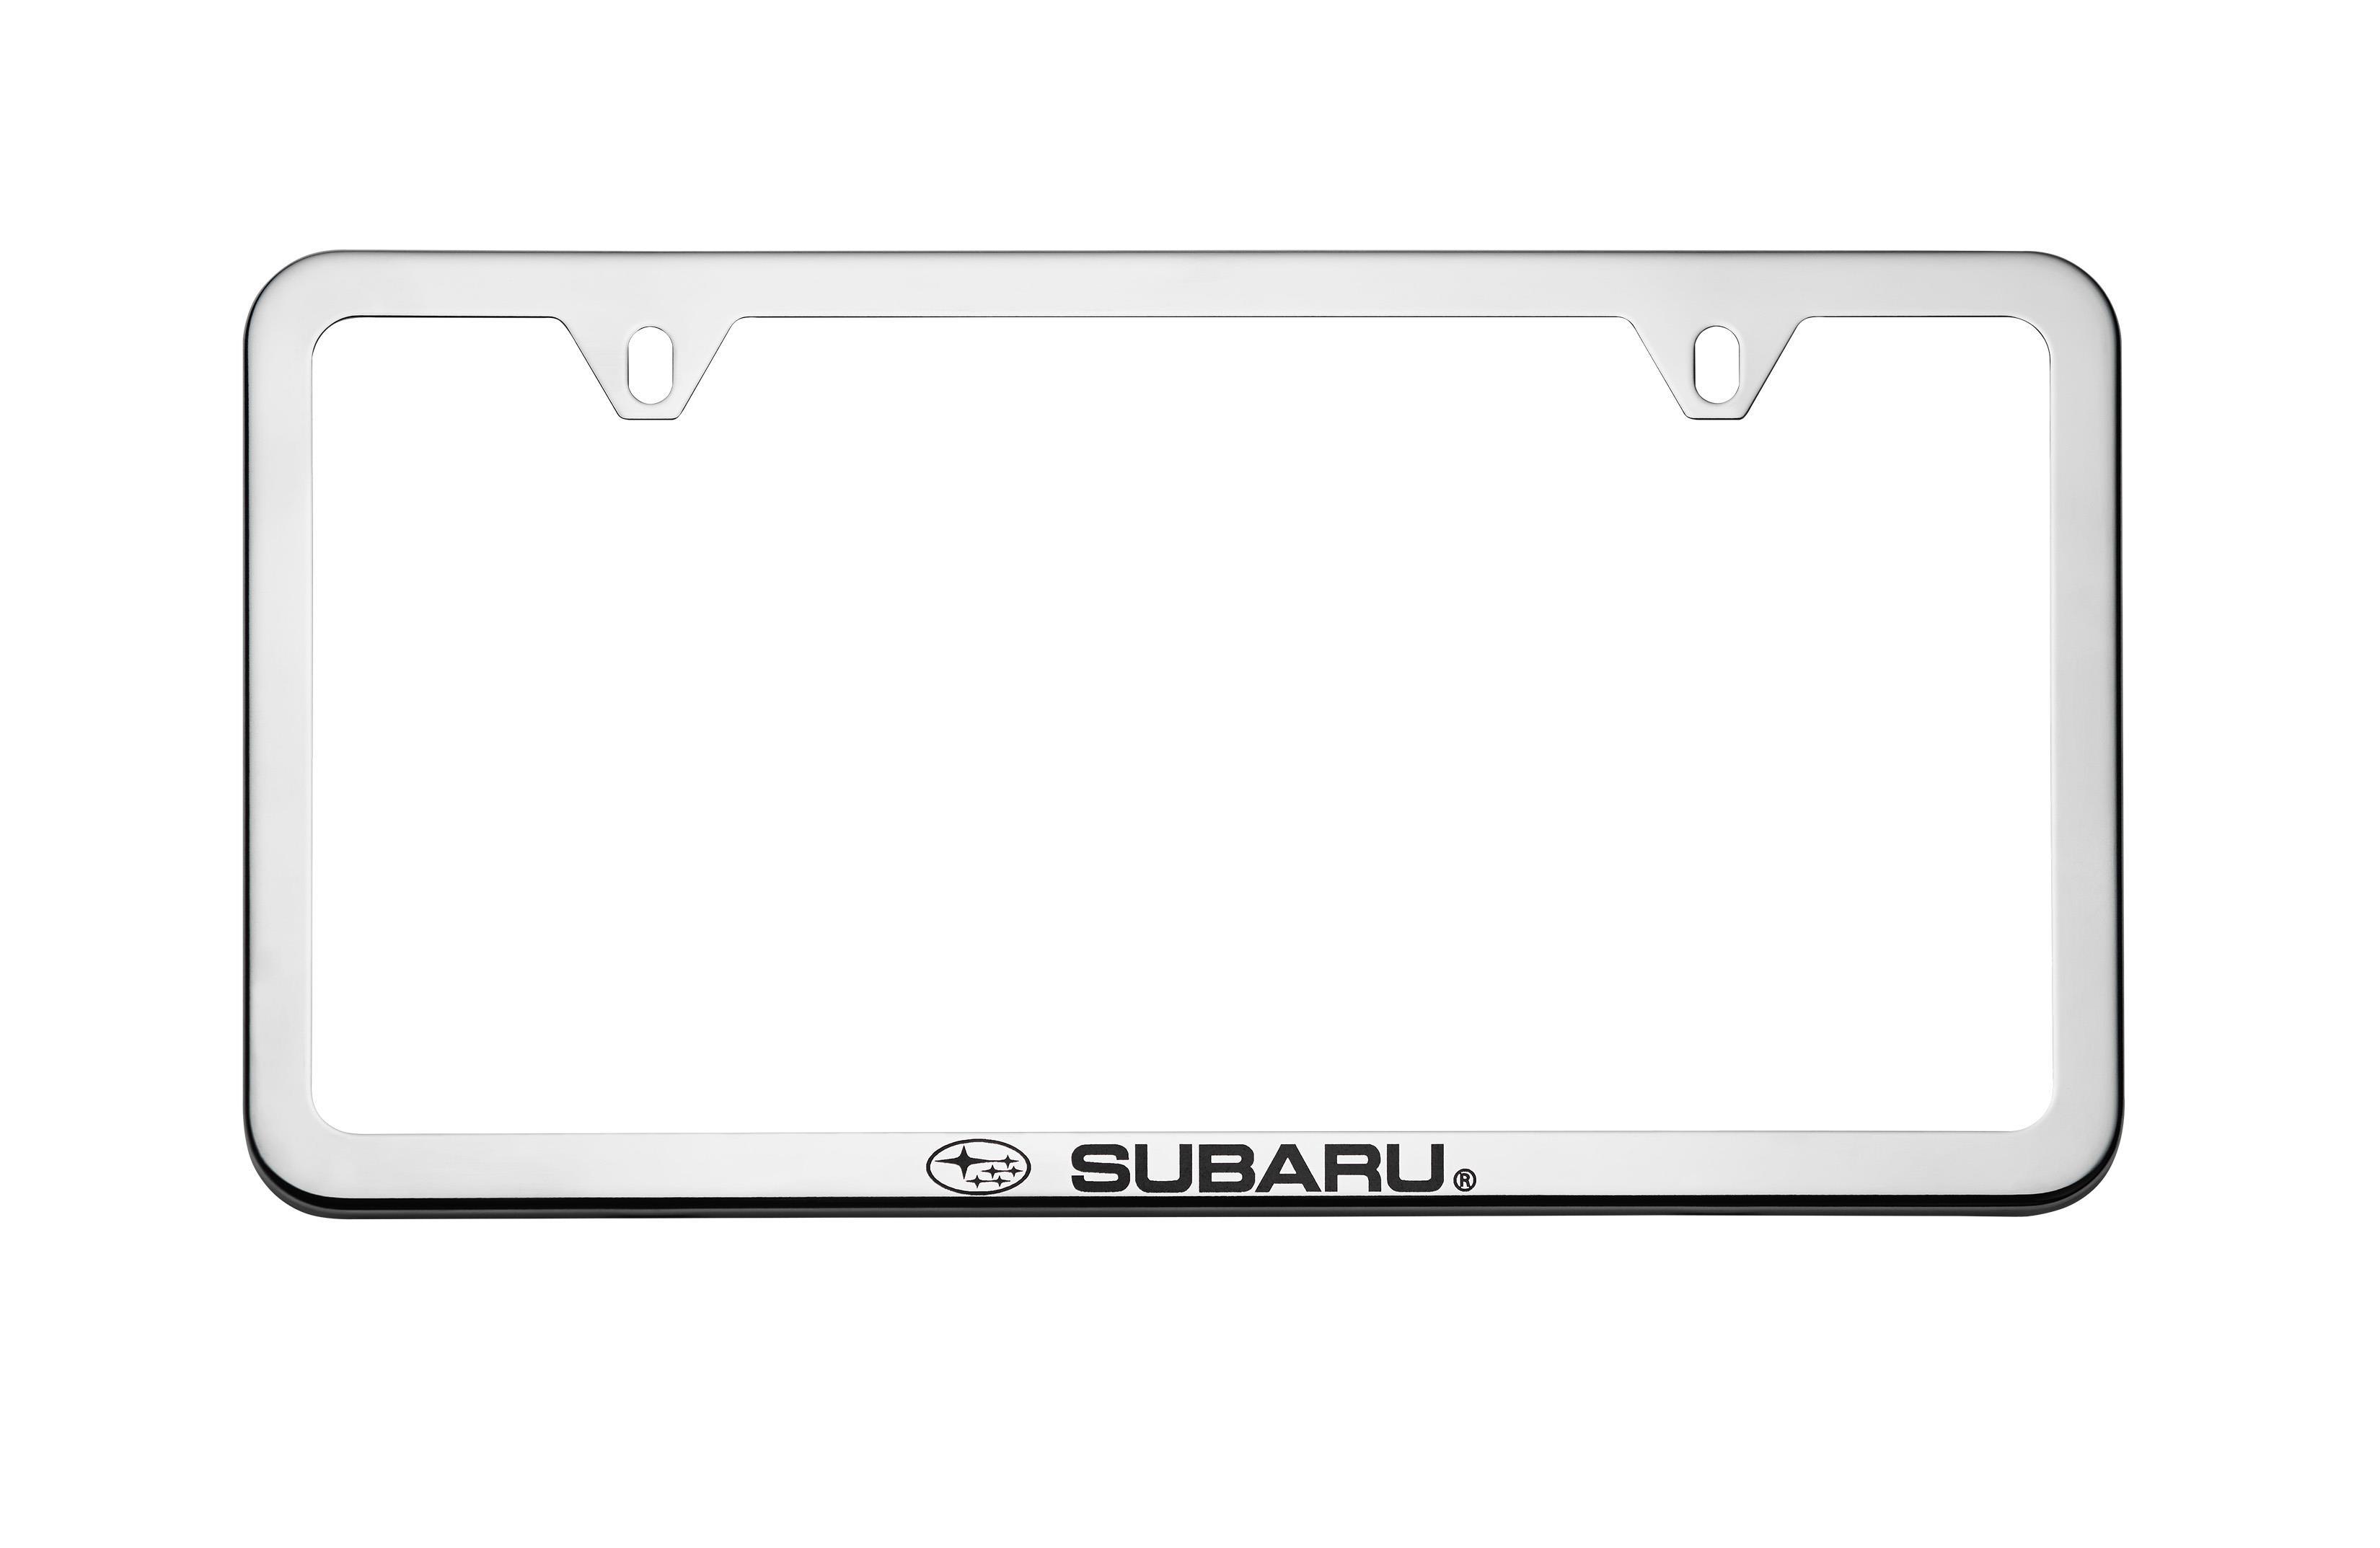 2016 Subaru Forester Subaru License Plate Frame Polished